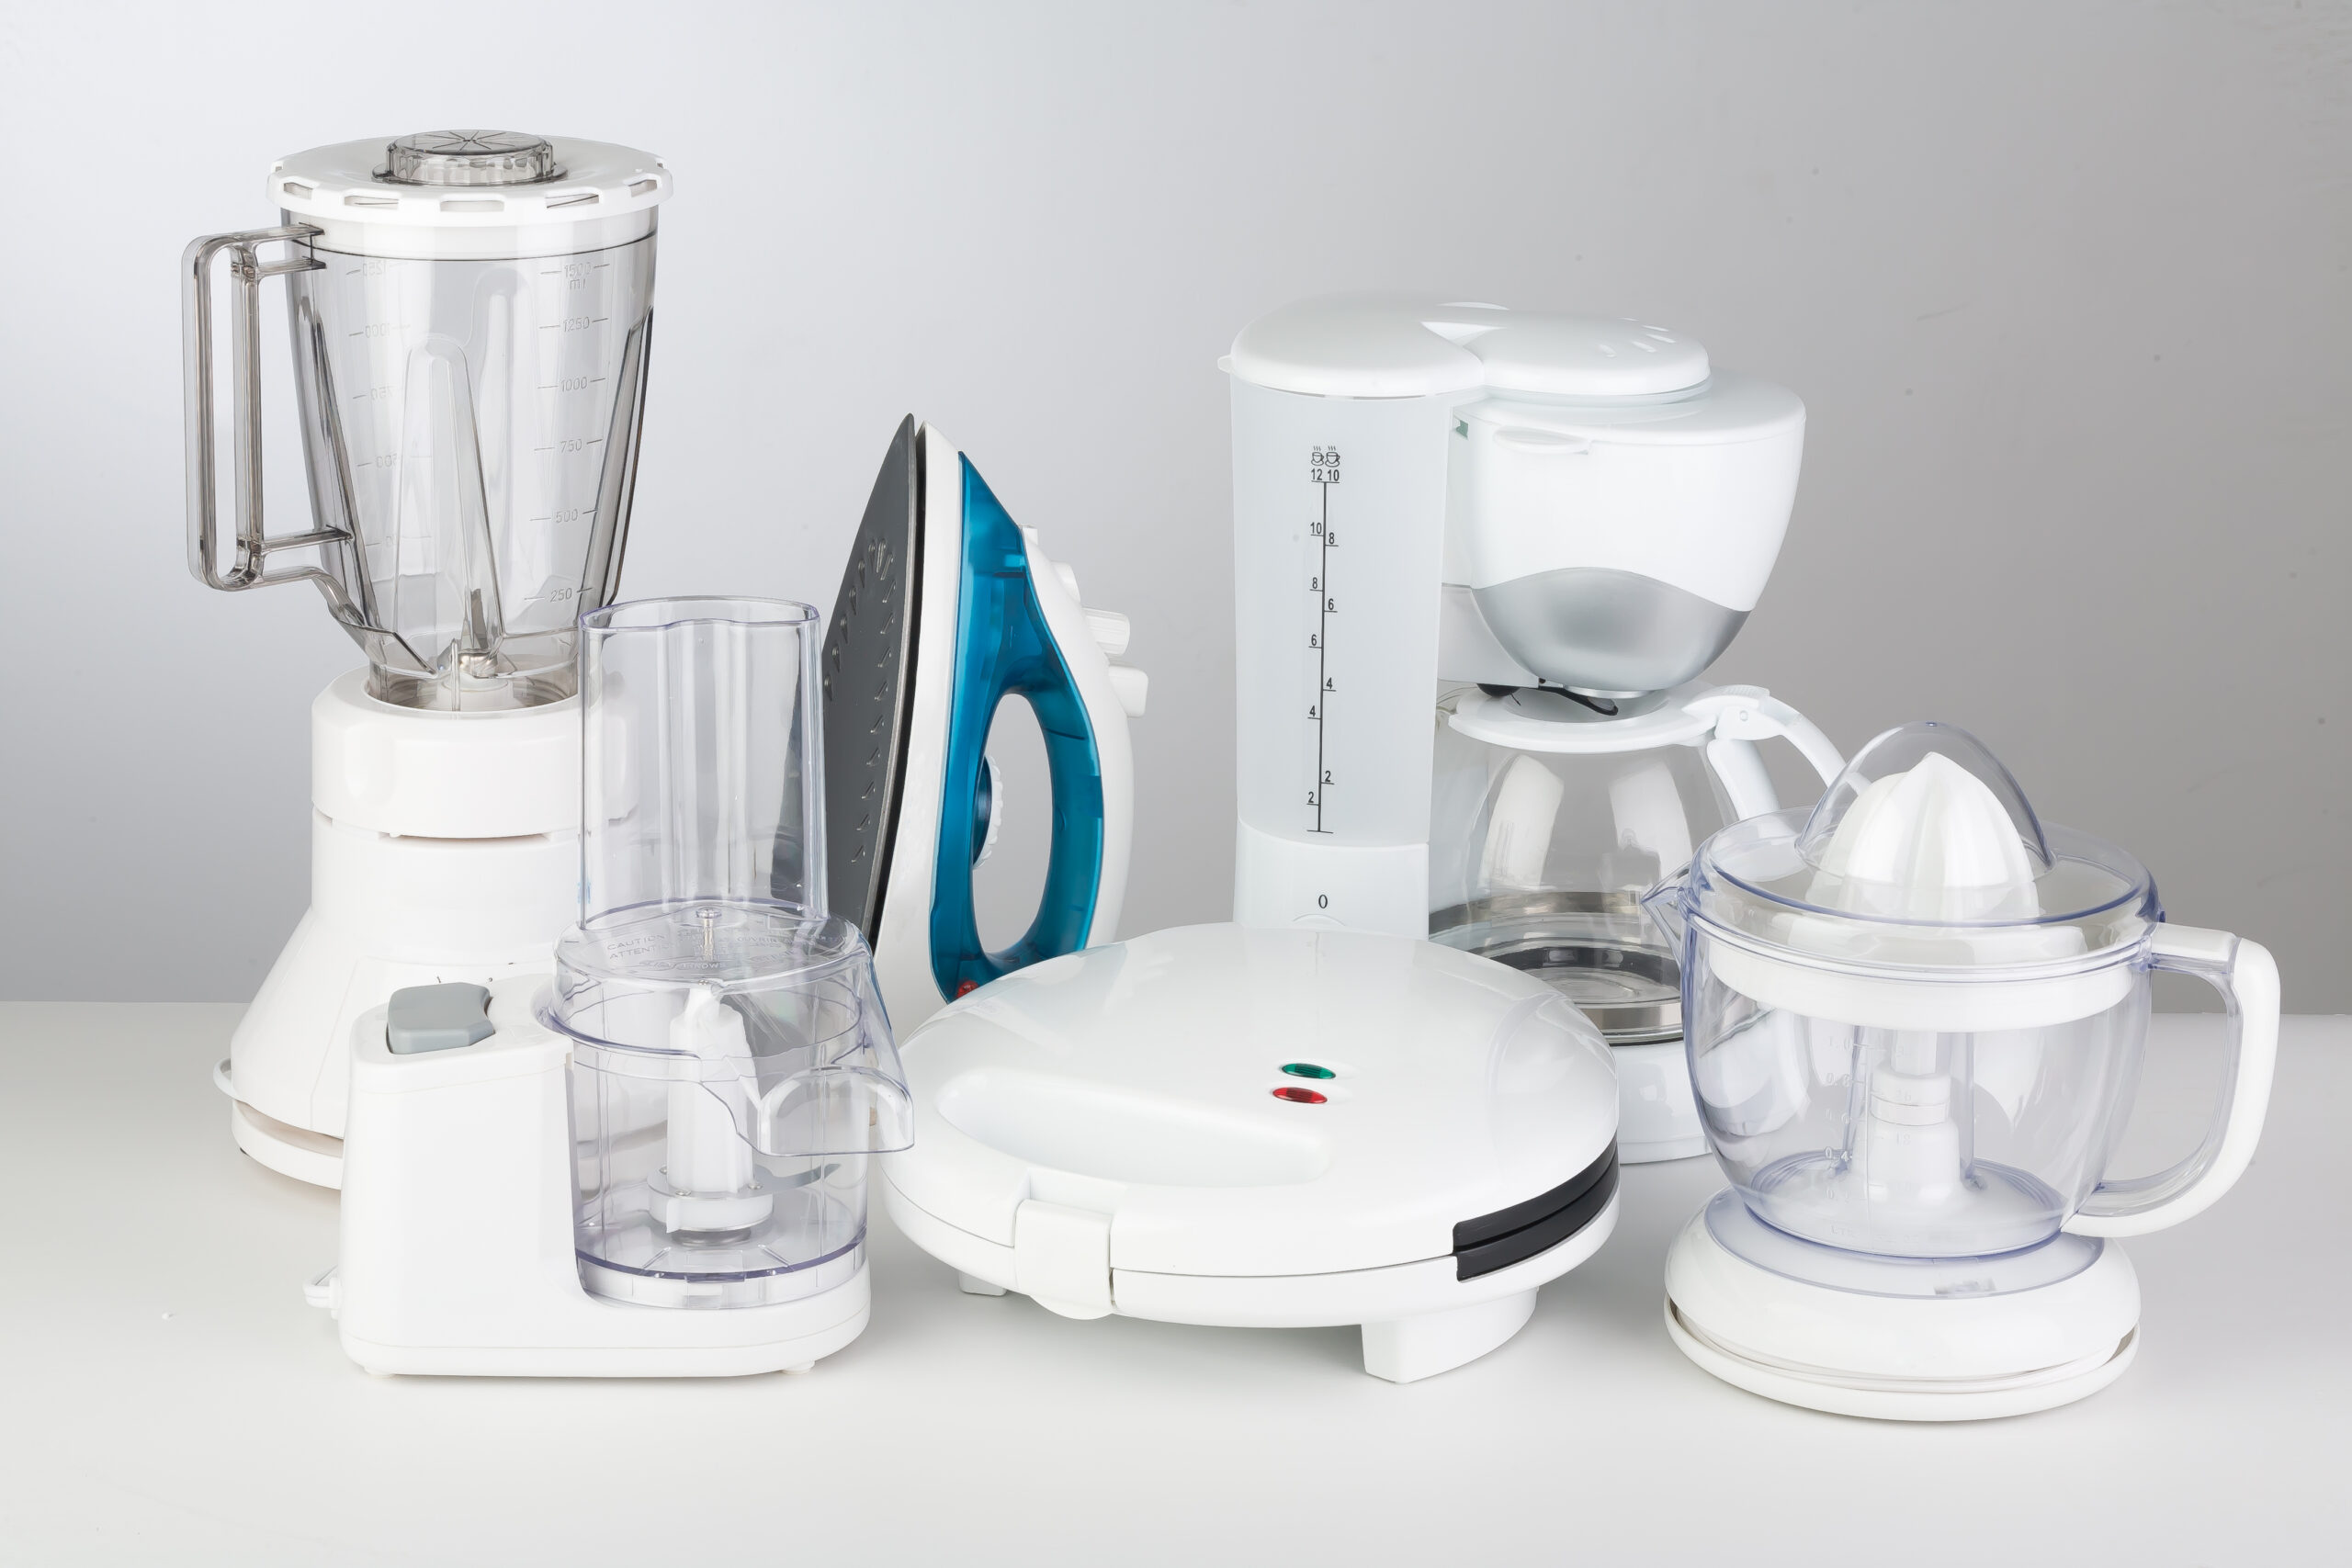 Kitchen,Appliances,On,A,Neutral,Background